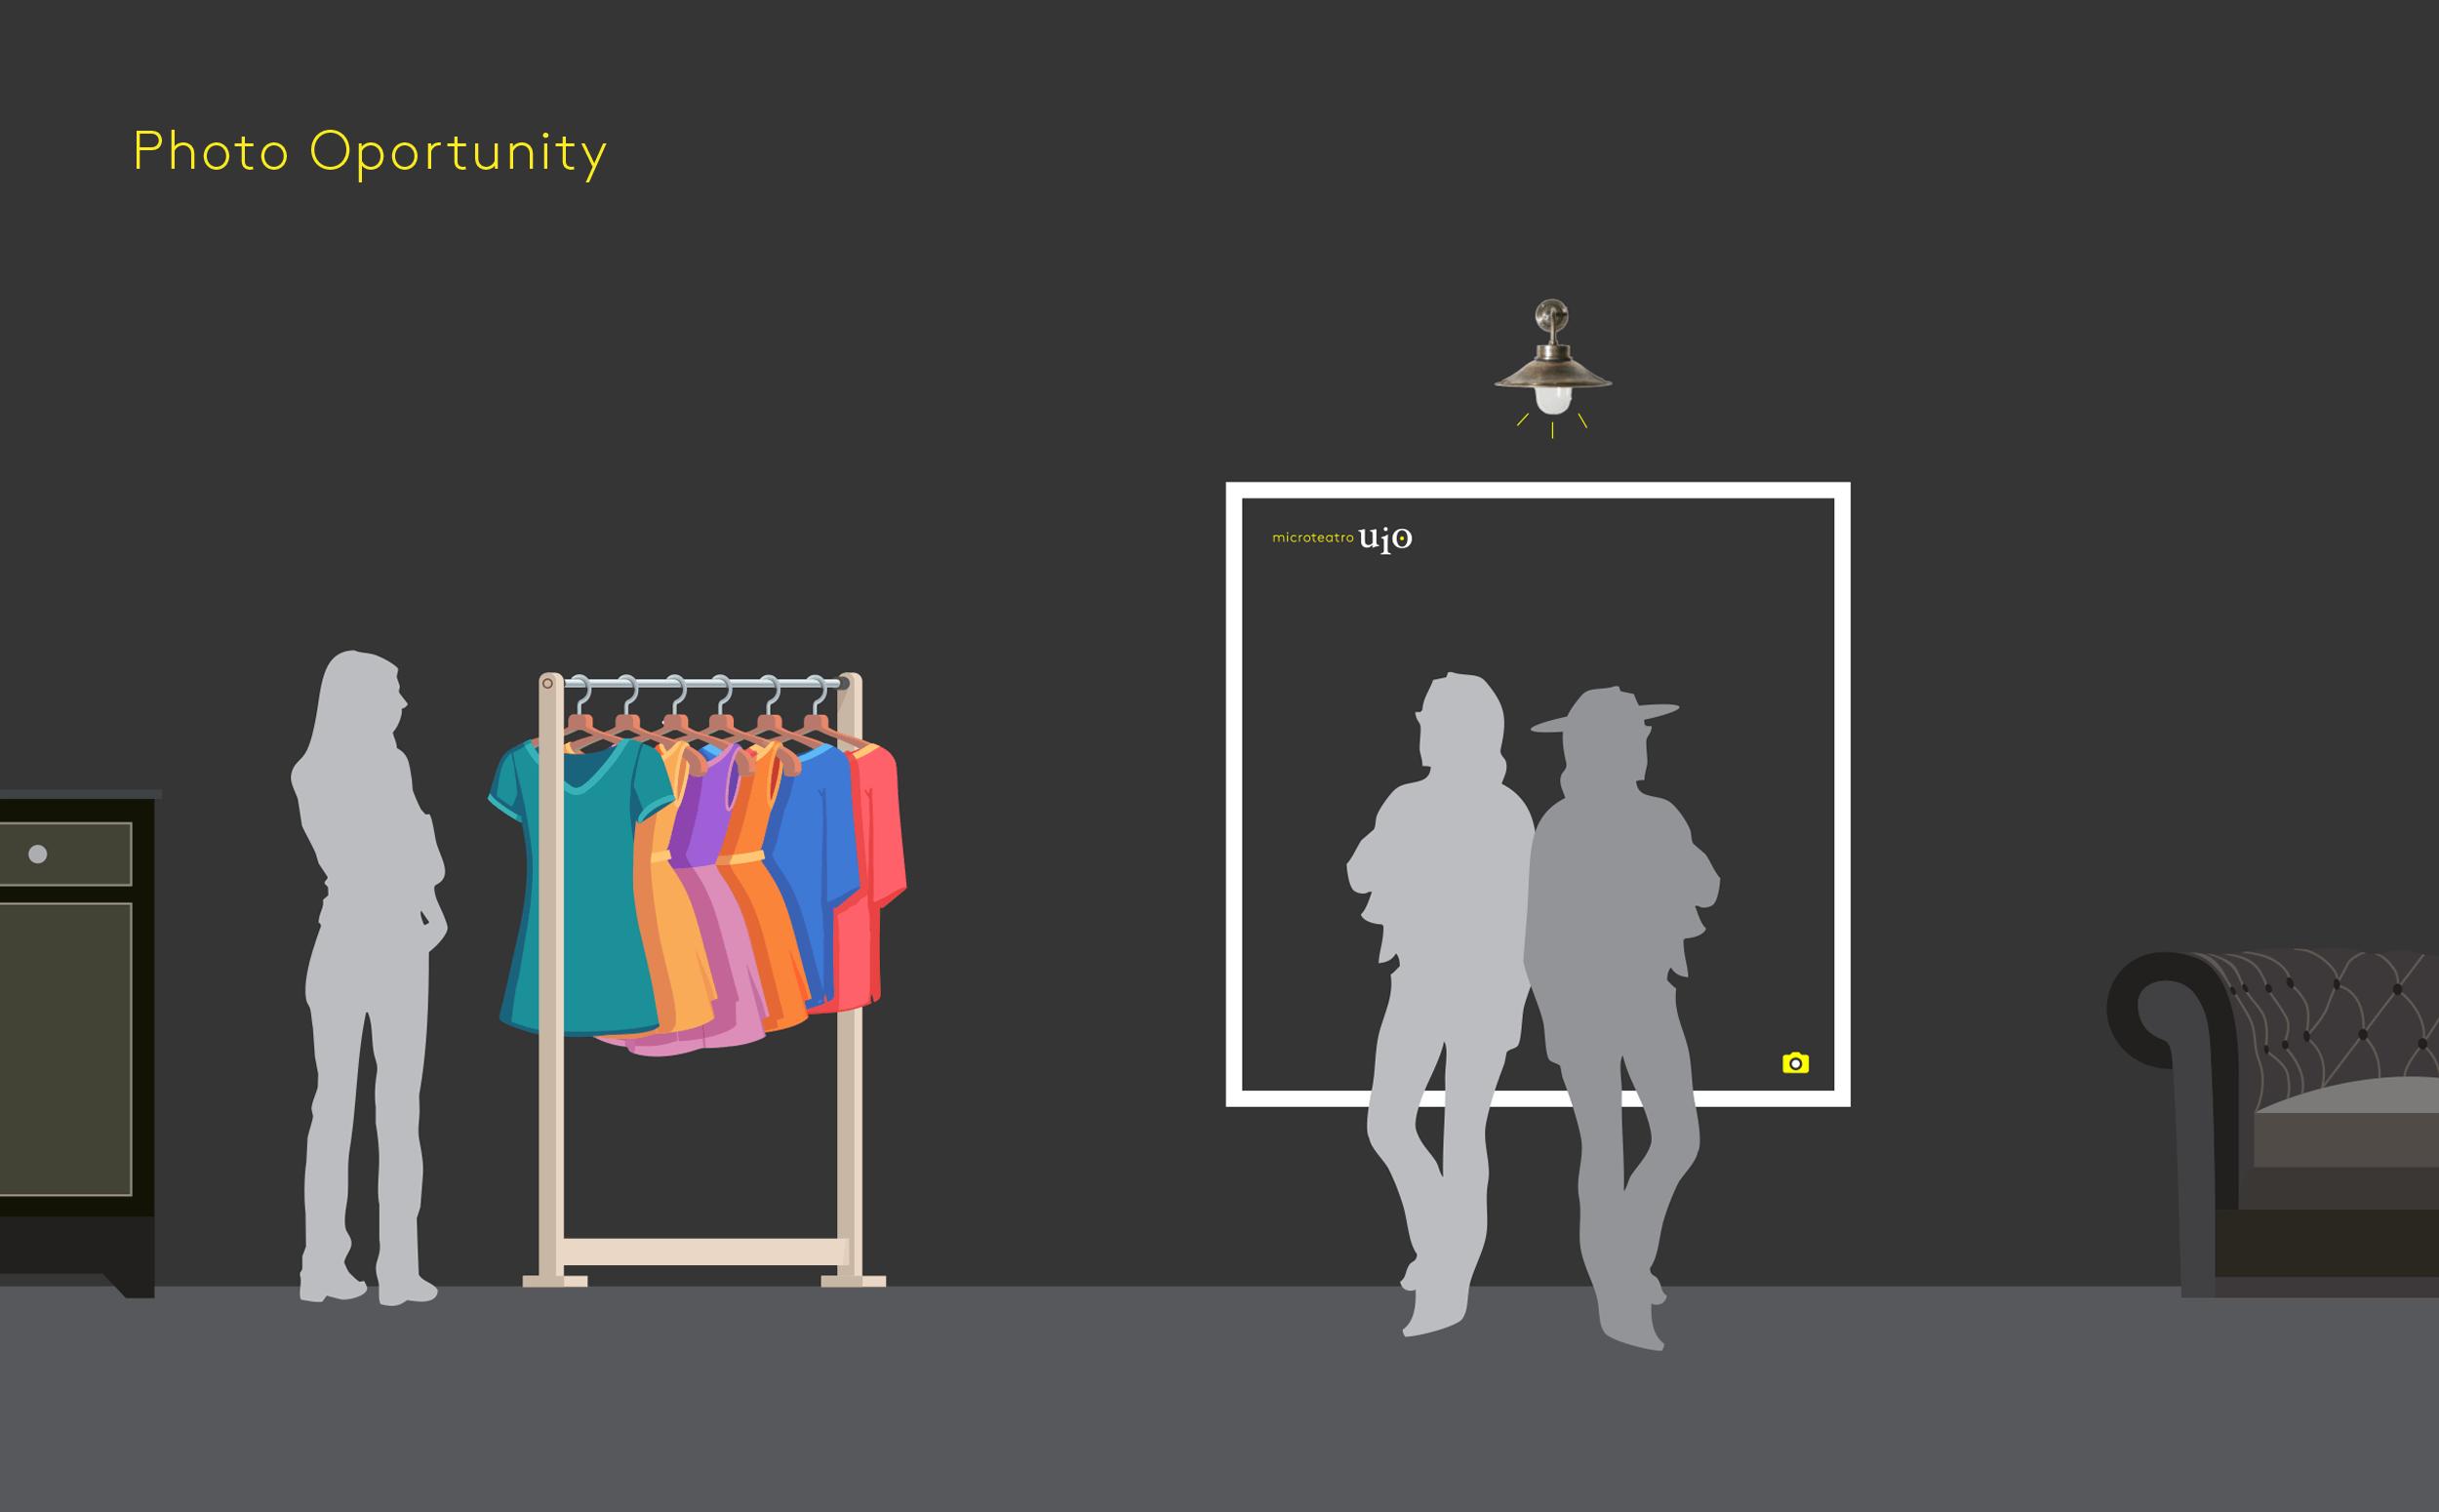 uio-photoportunity